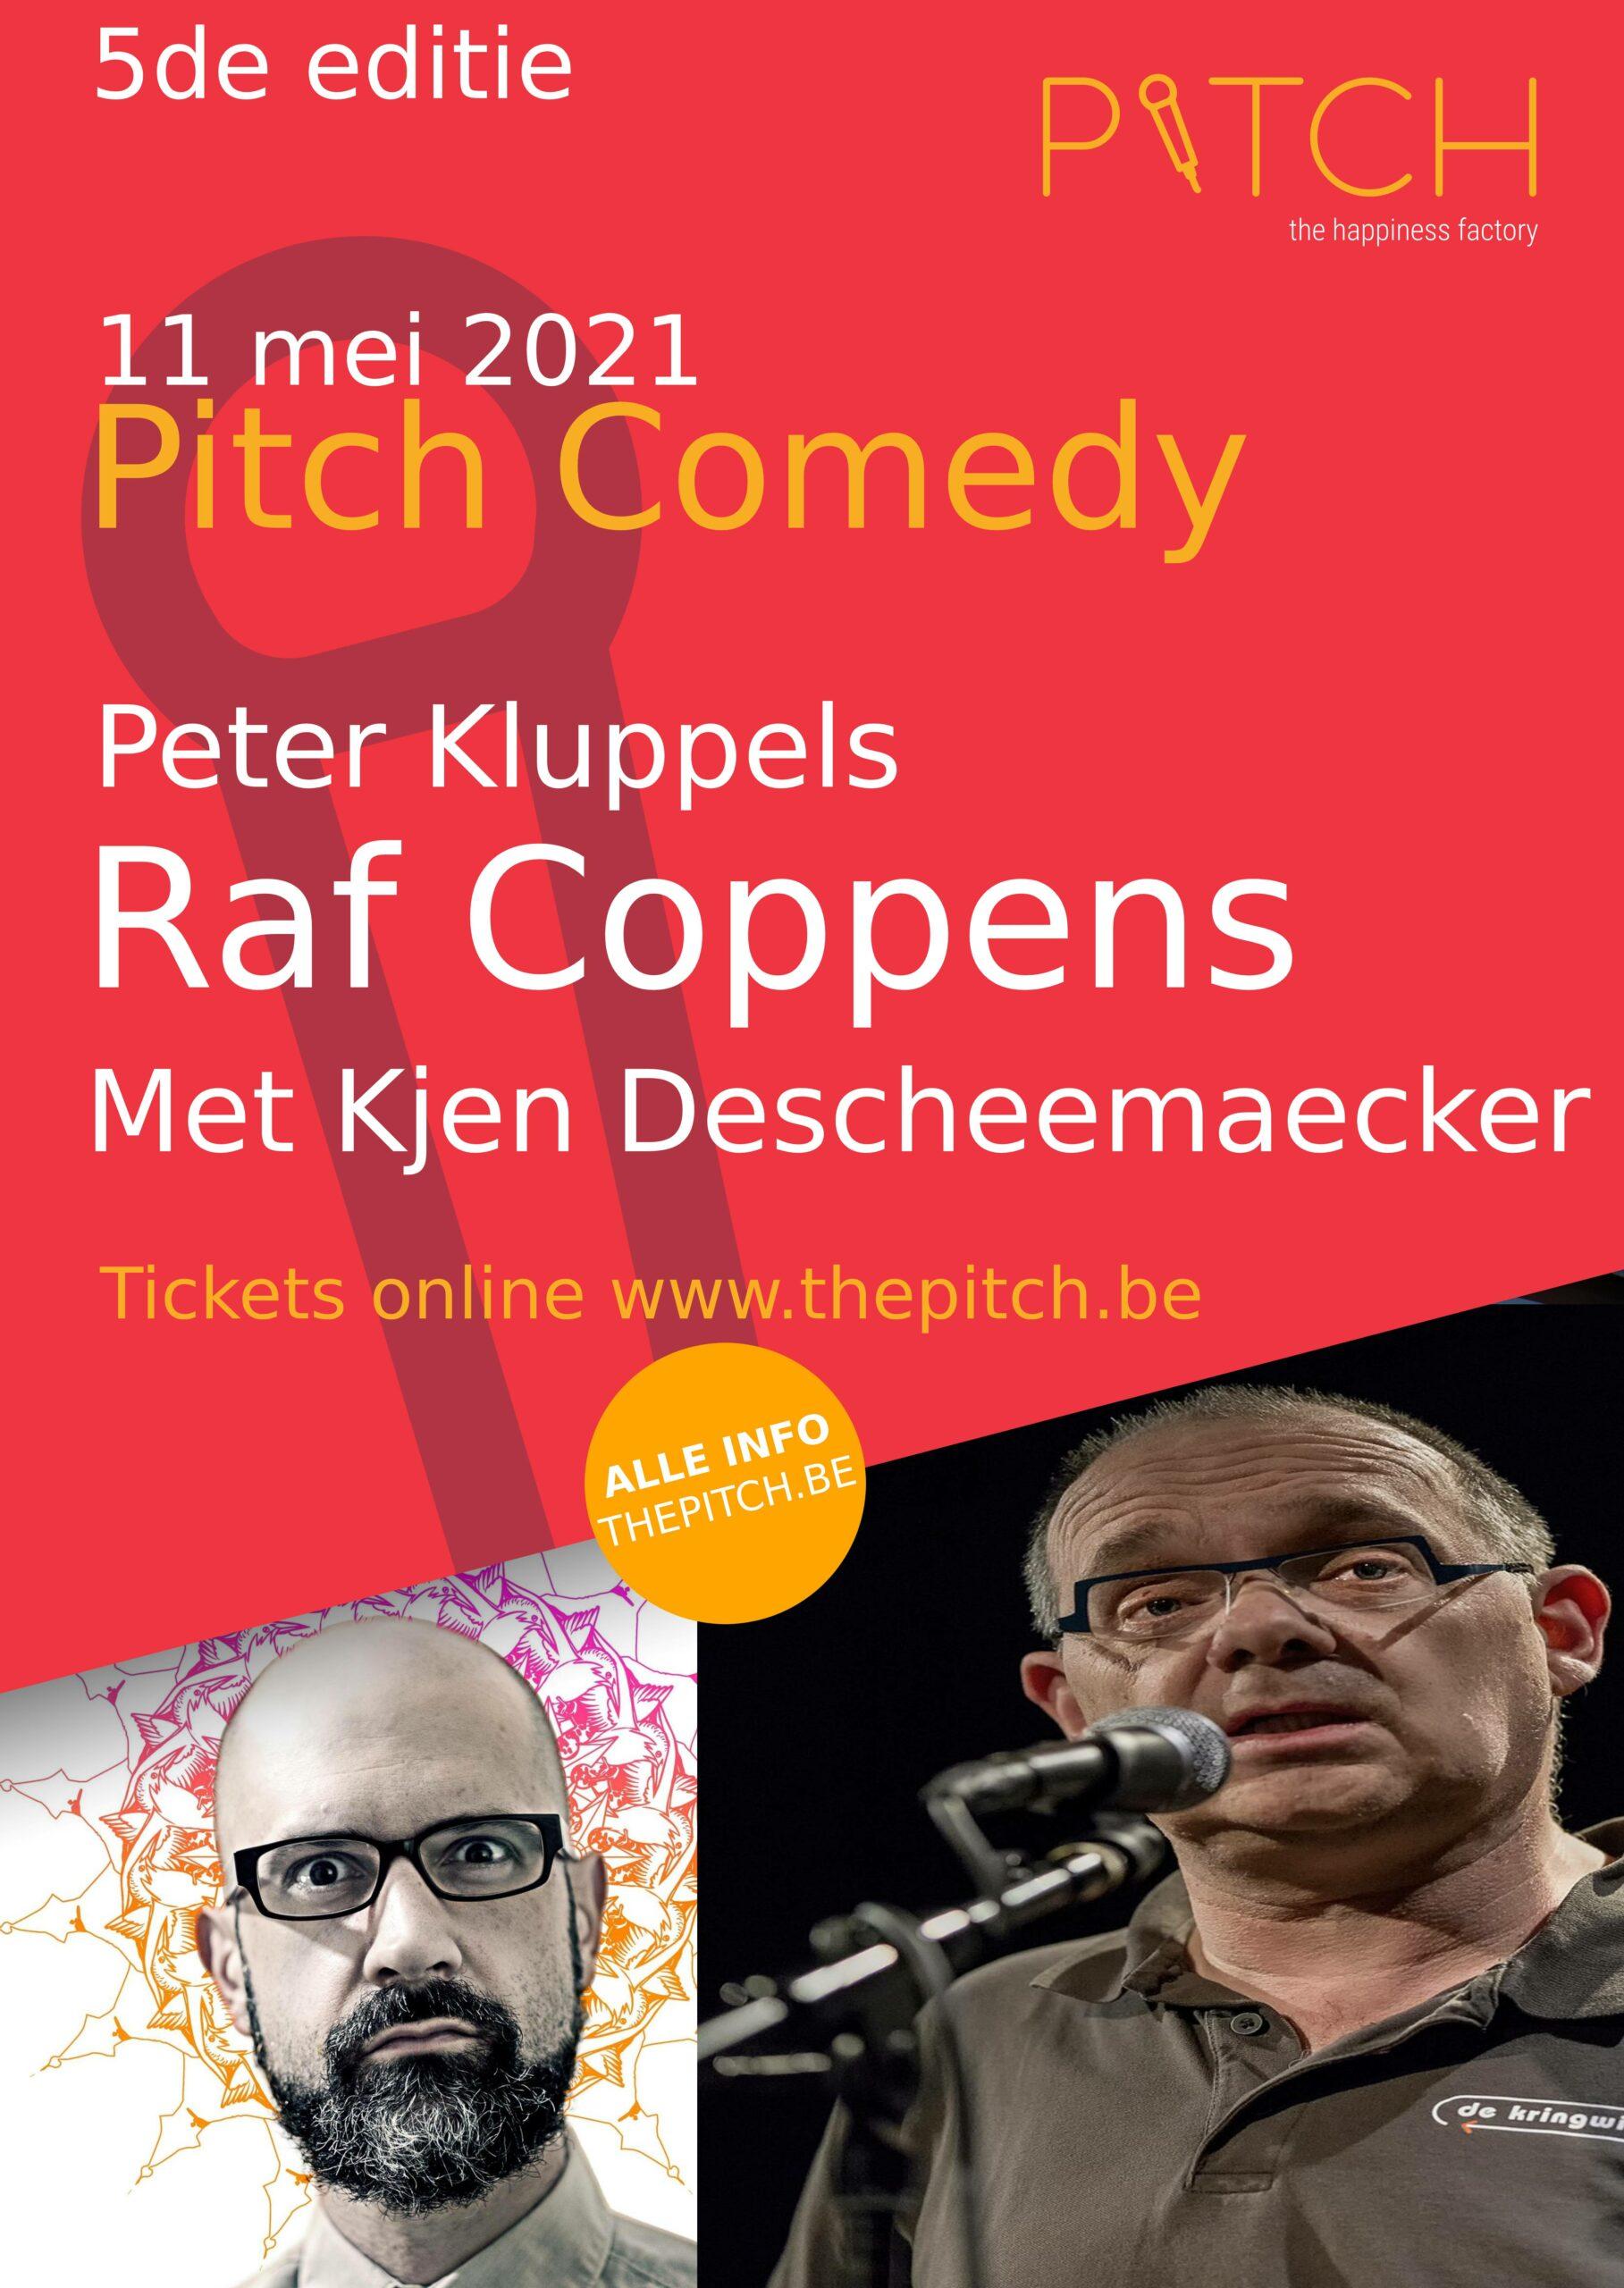 Raf coppens comedy en Peter Kluppels in Pitch Kortrijk